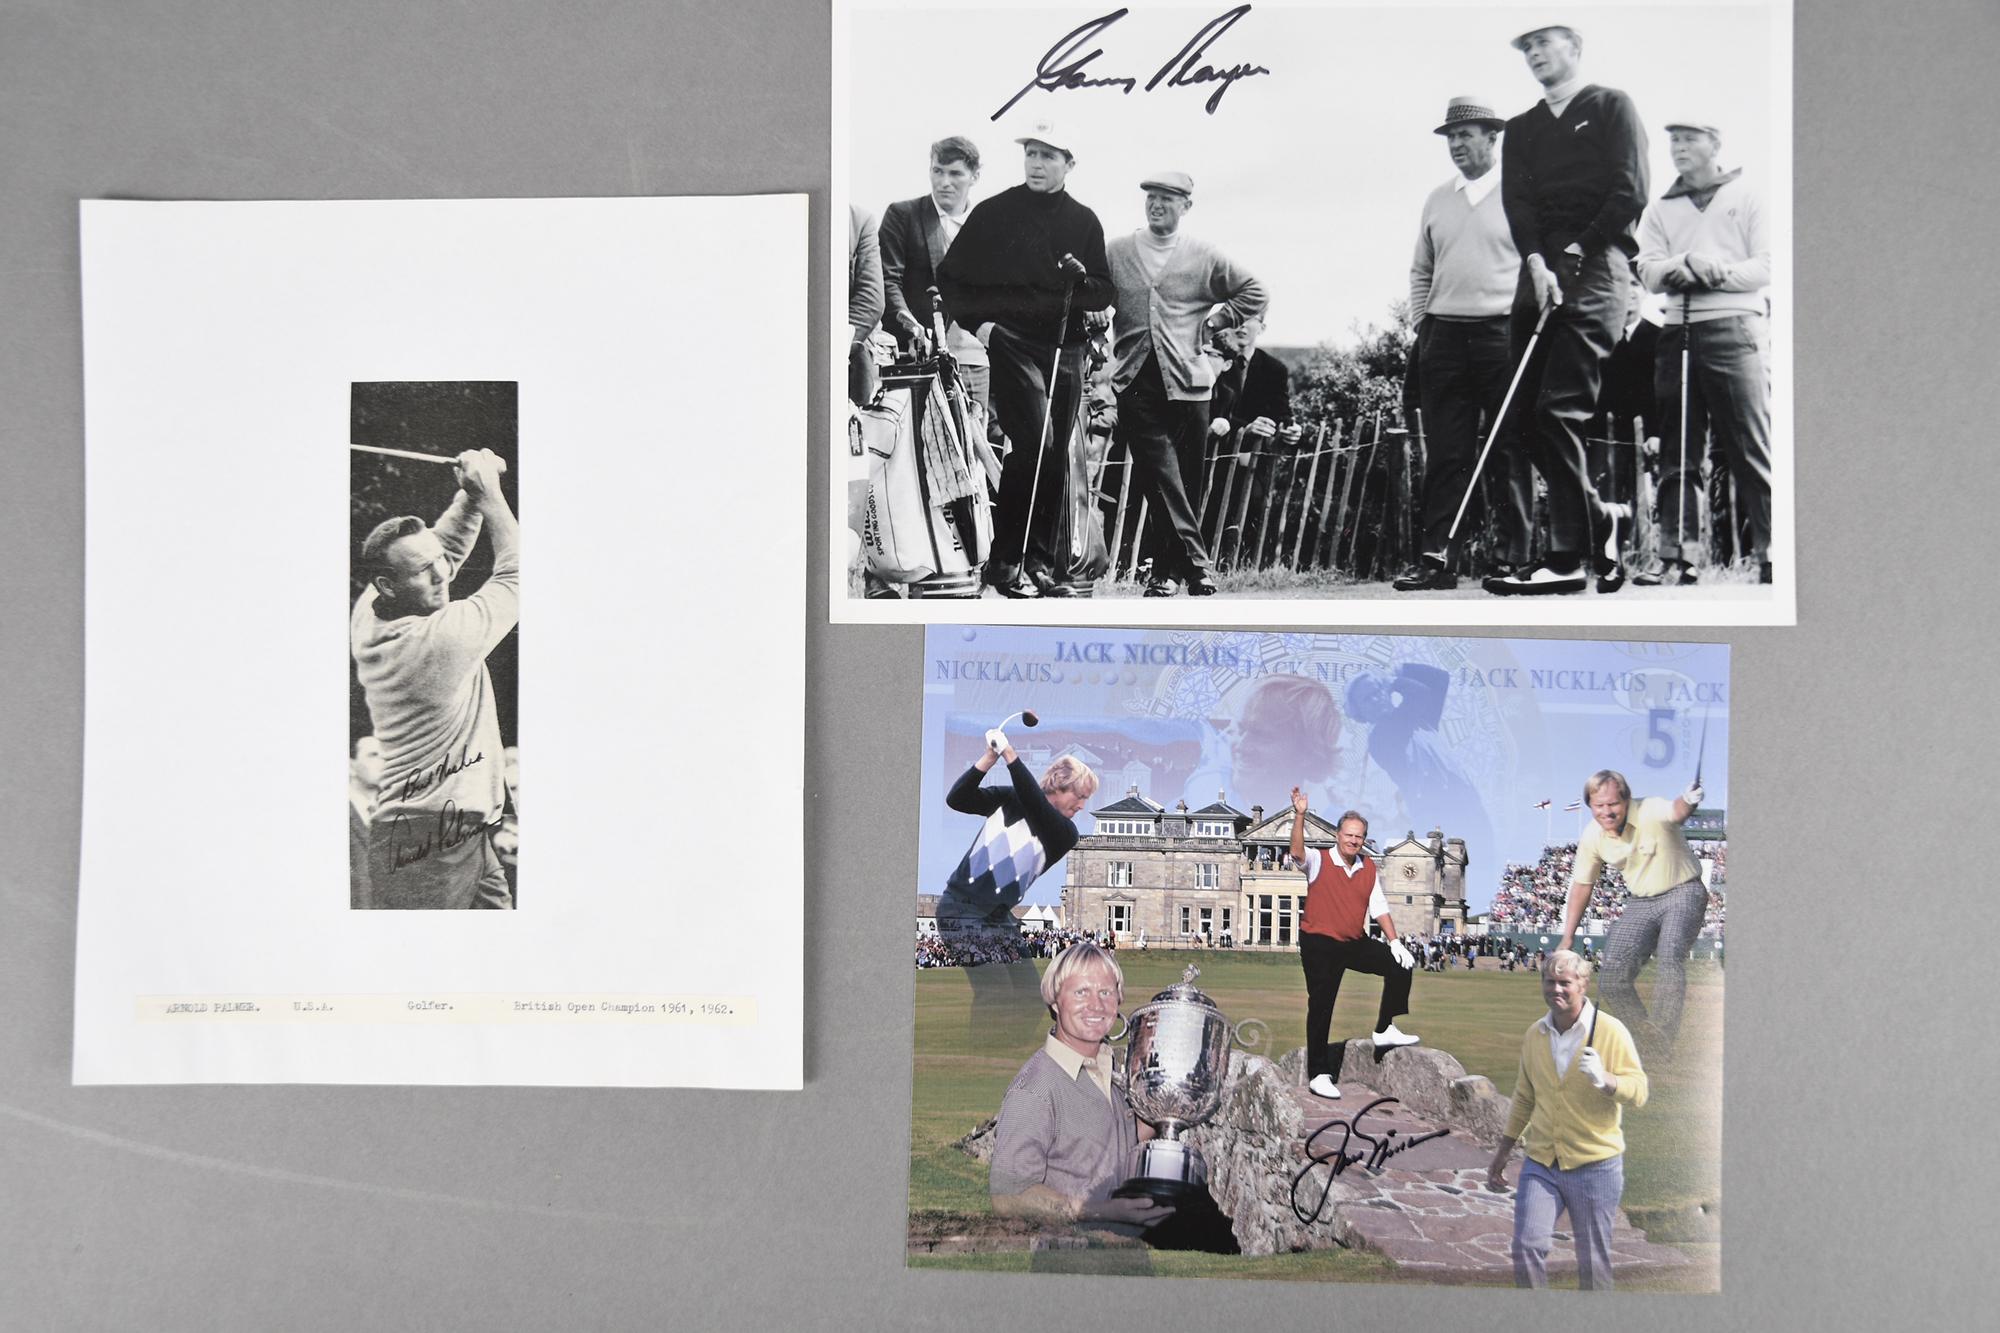 JACK NICKLAUS, GARY PLAYER & ARNOLD PALMER Original signatures. - Image 3 of 4